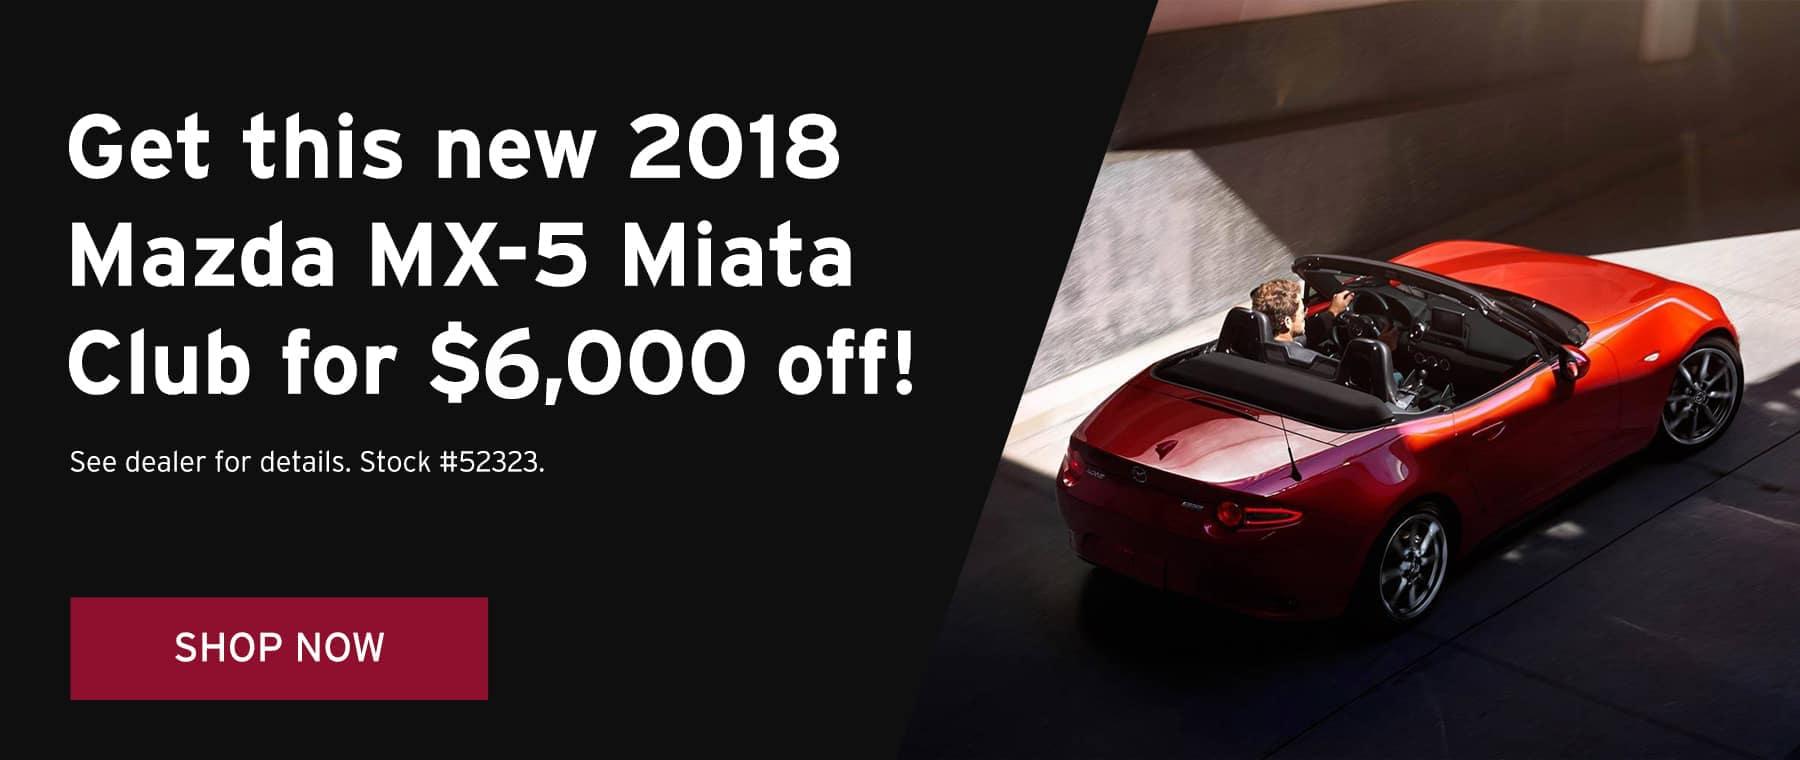 1 / 1 – Mazda-MX-5-Miata-Grand-Club-1_bn3 (1).jpg